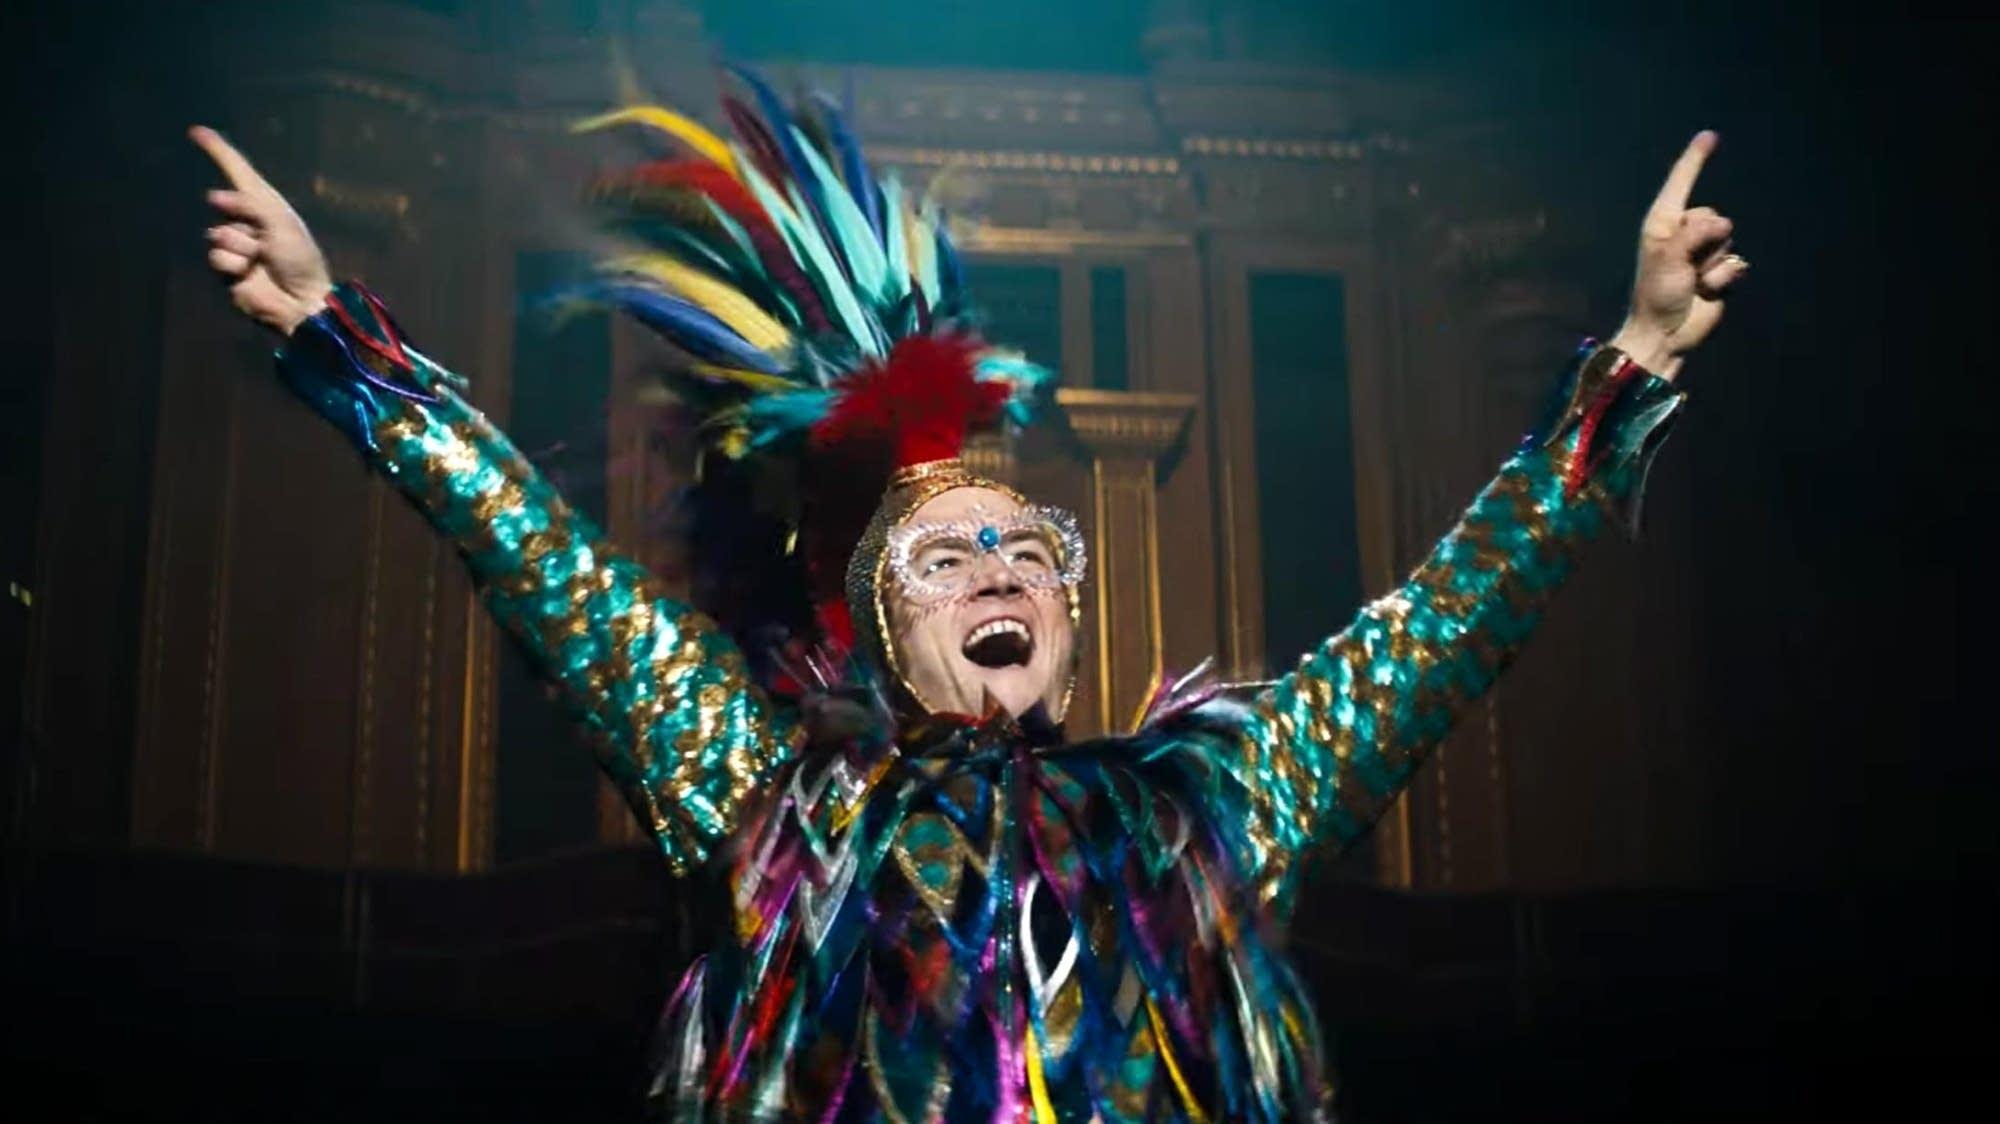 Taron Egerton as Elton John in 'Rocketman.'